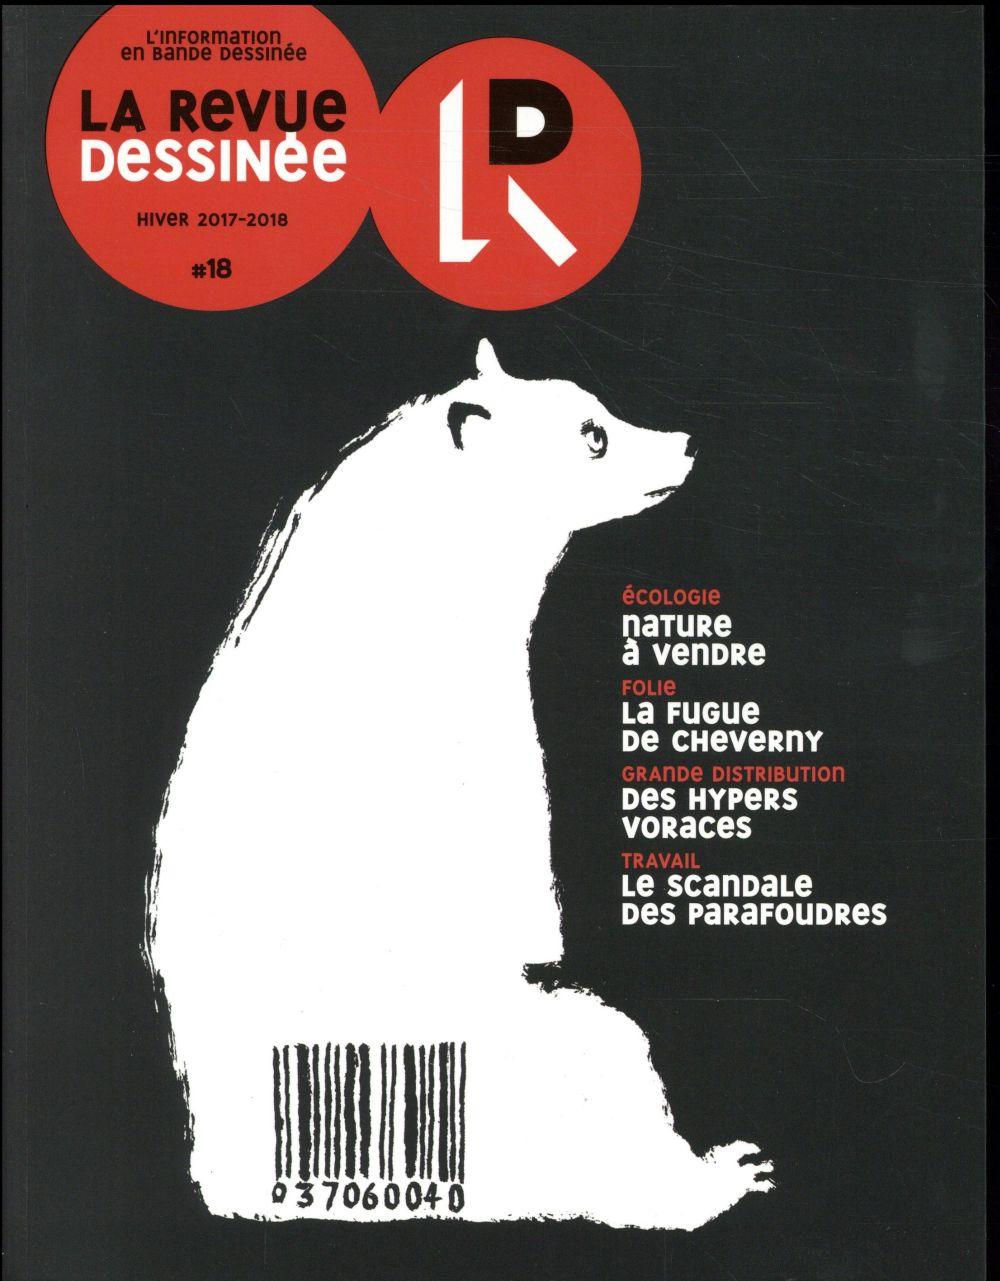 La revue dessinee n.18